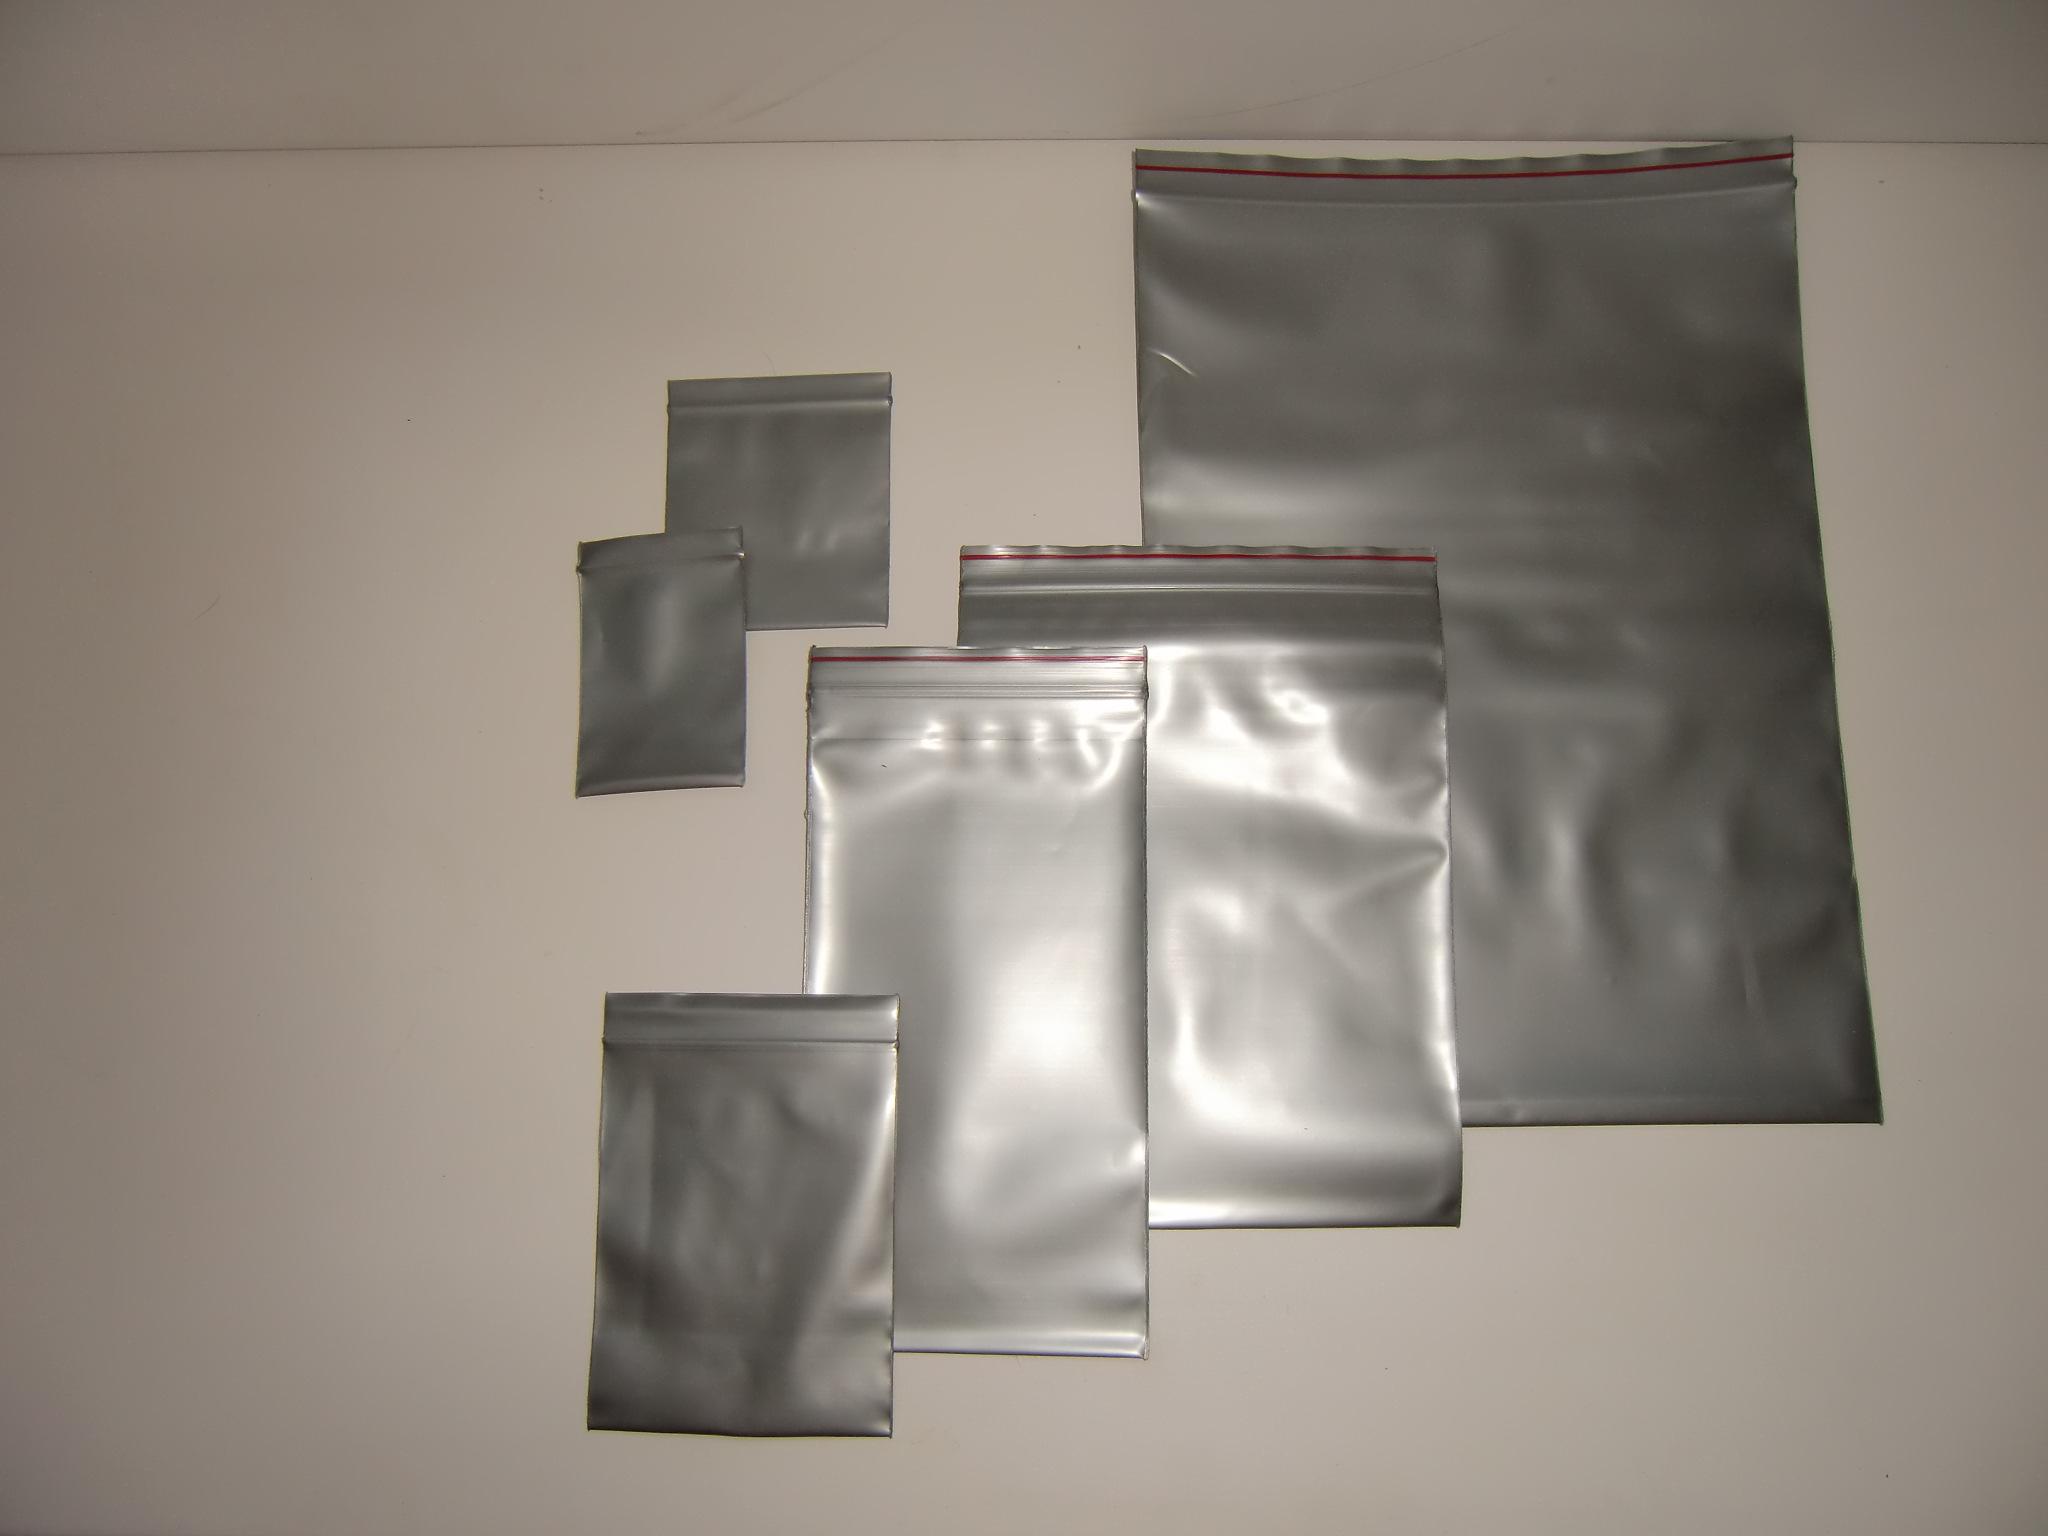 пакеты целлофановые zip